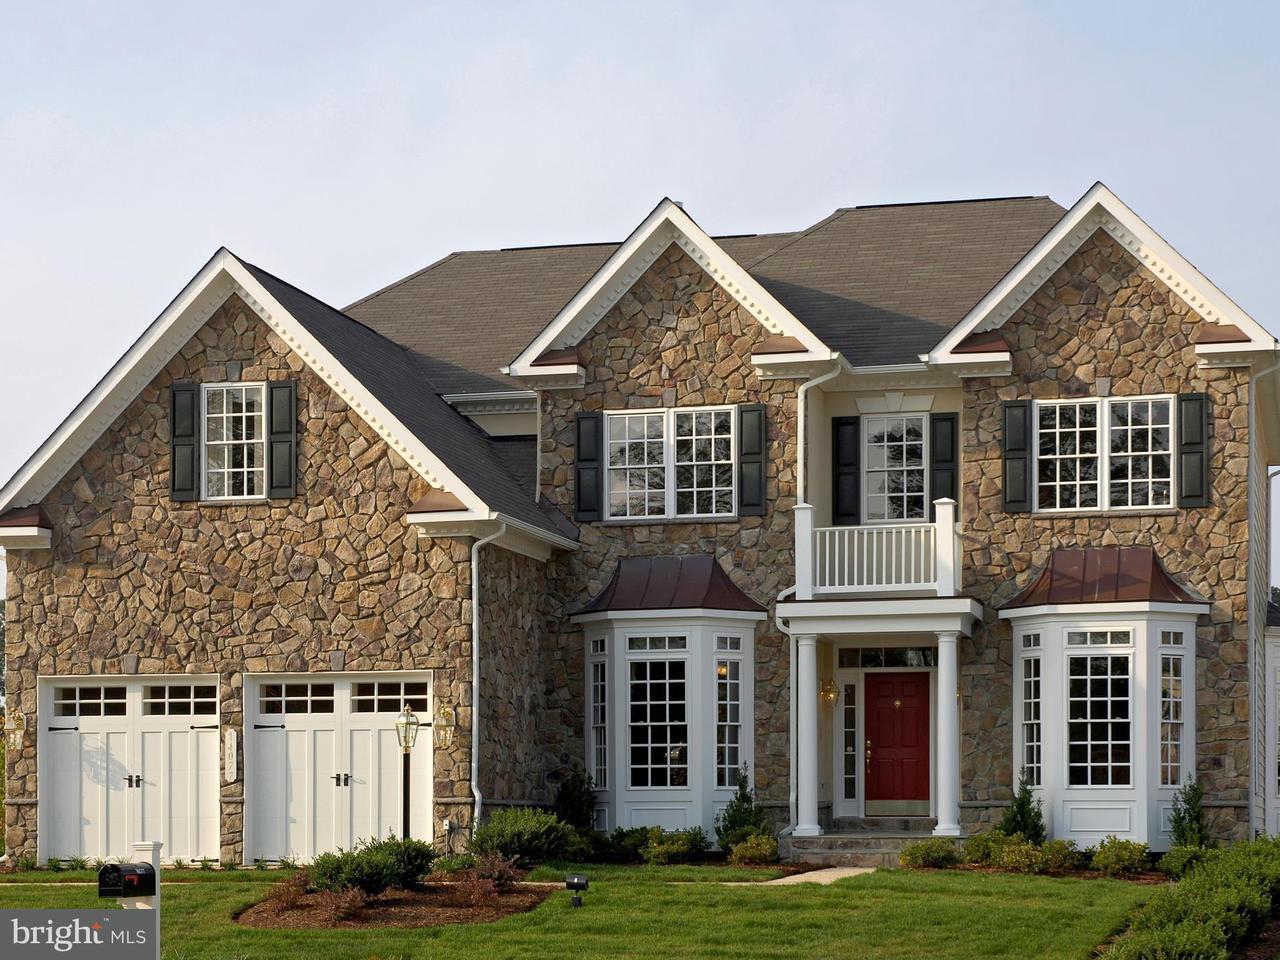 Single Family Home for Sale at 13665 Hidden Creek Road 13665 Hidden Creek Road Manassas, Virginia 20112 United States